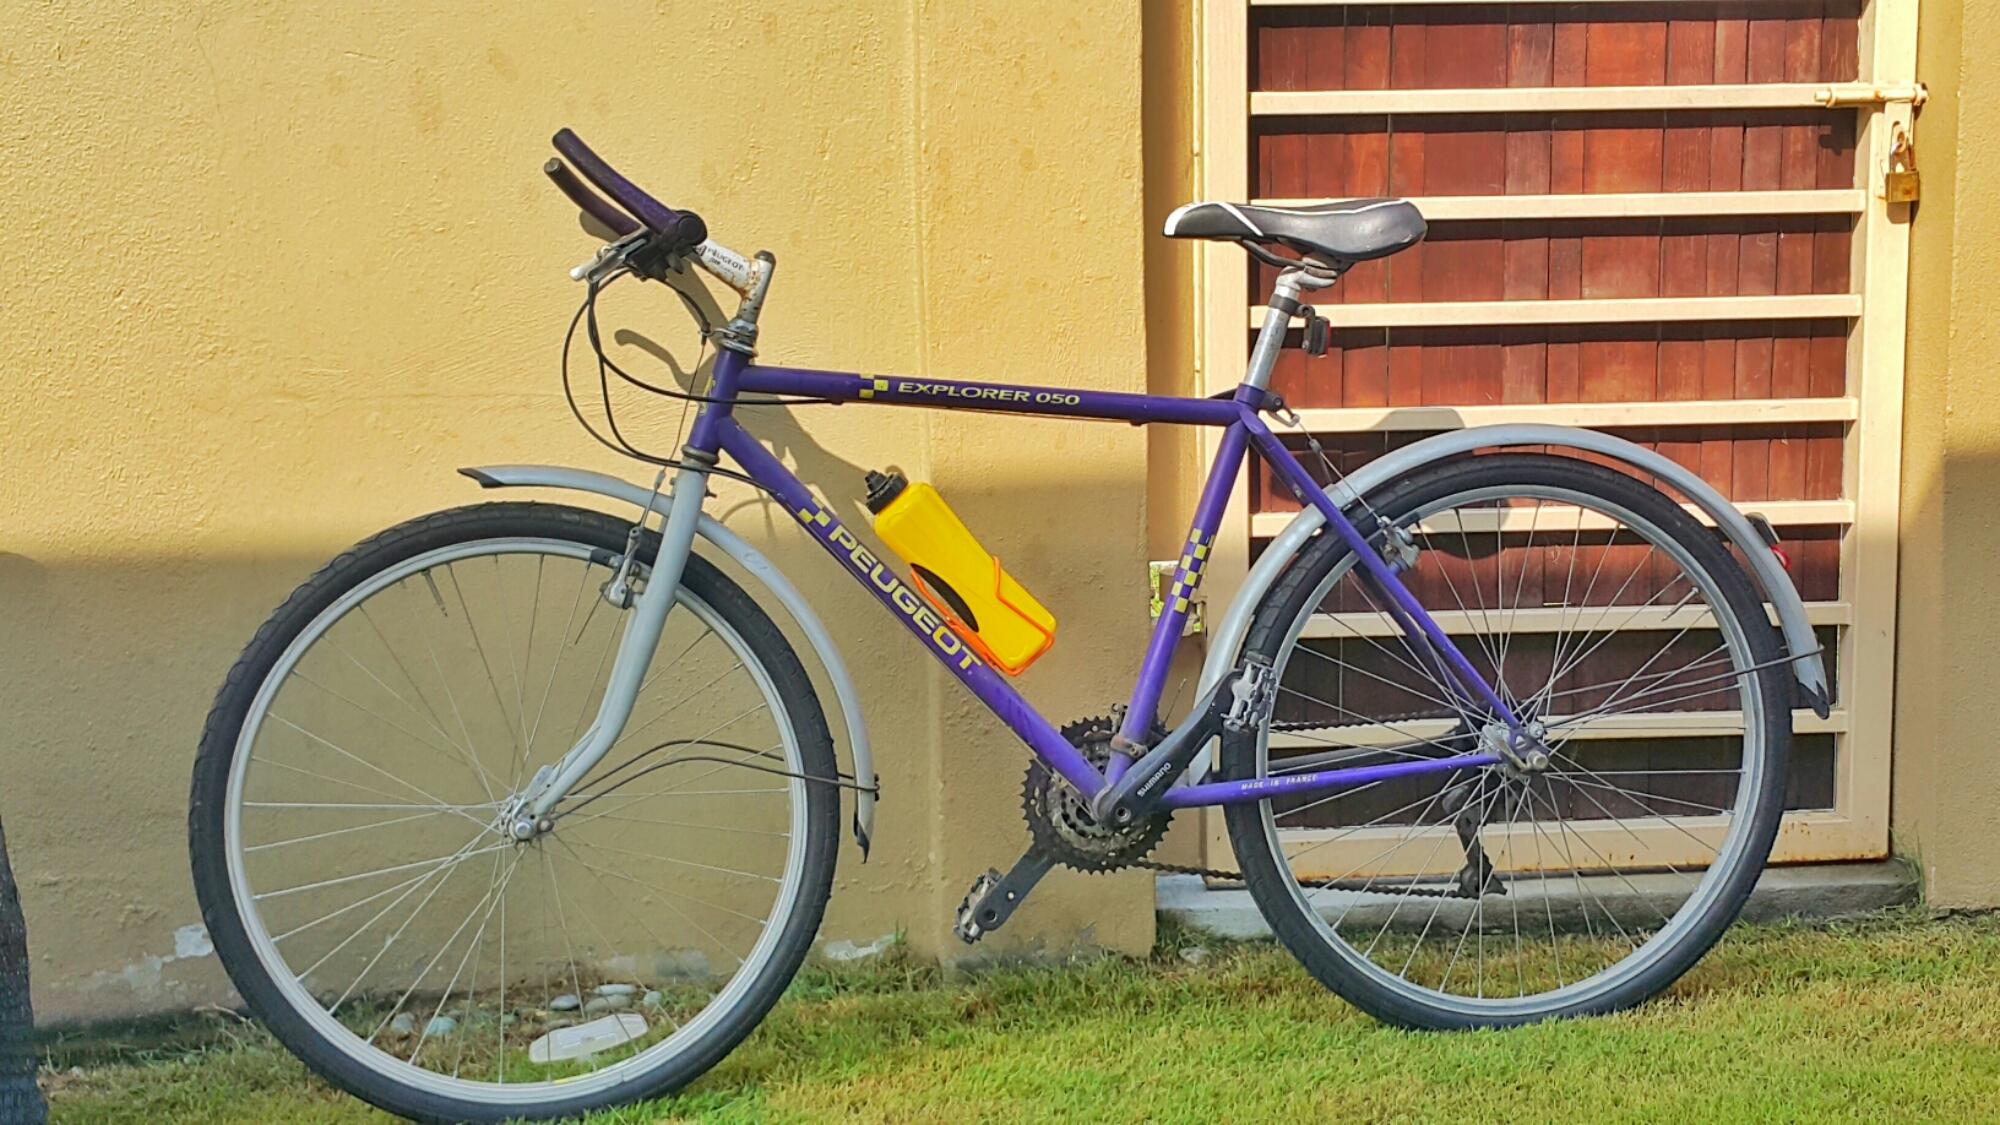 Peugeot Explorer Bike Cheap Online